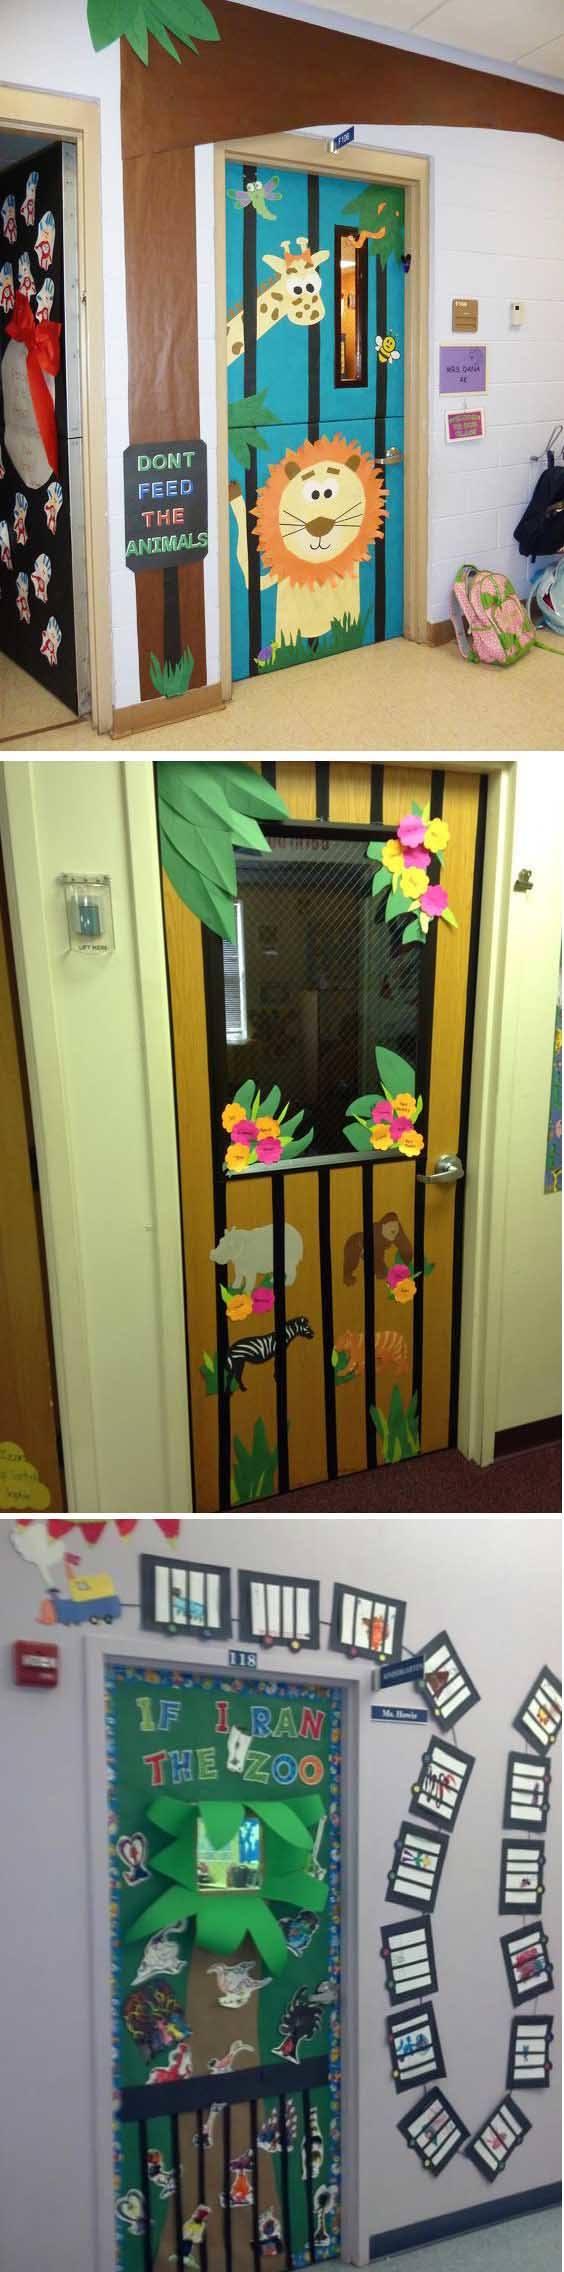 门饰 3.2.jpg